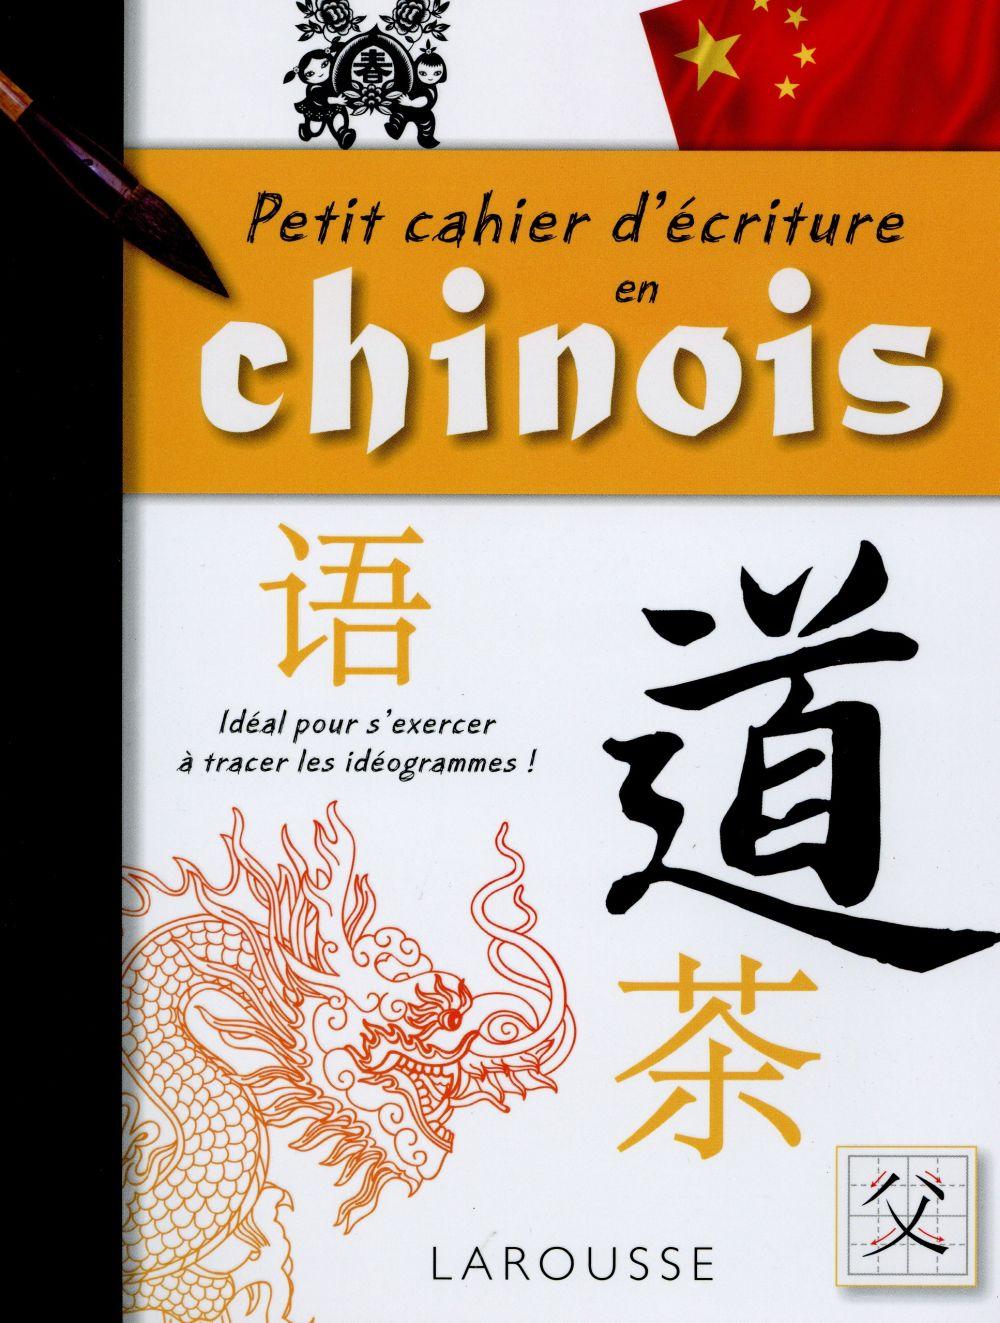 PETIT CAHIER D'ECRITURE CHINOIS